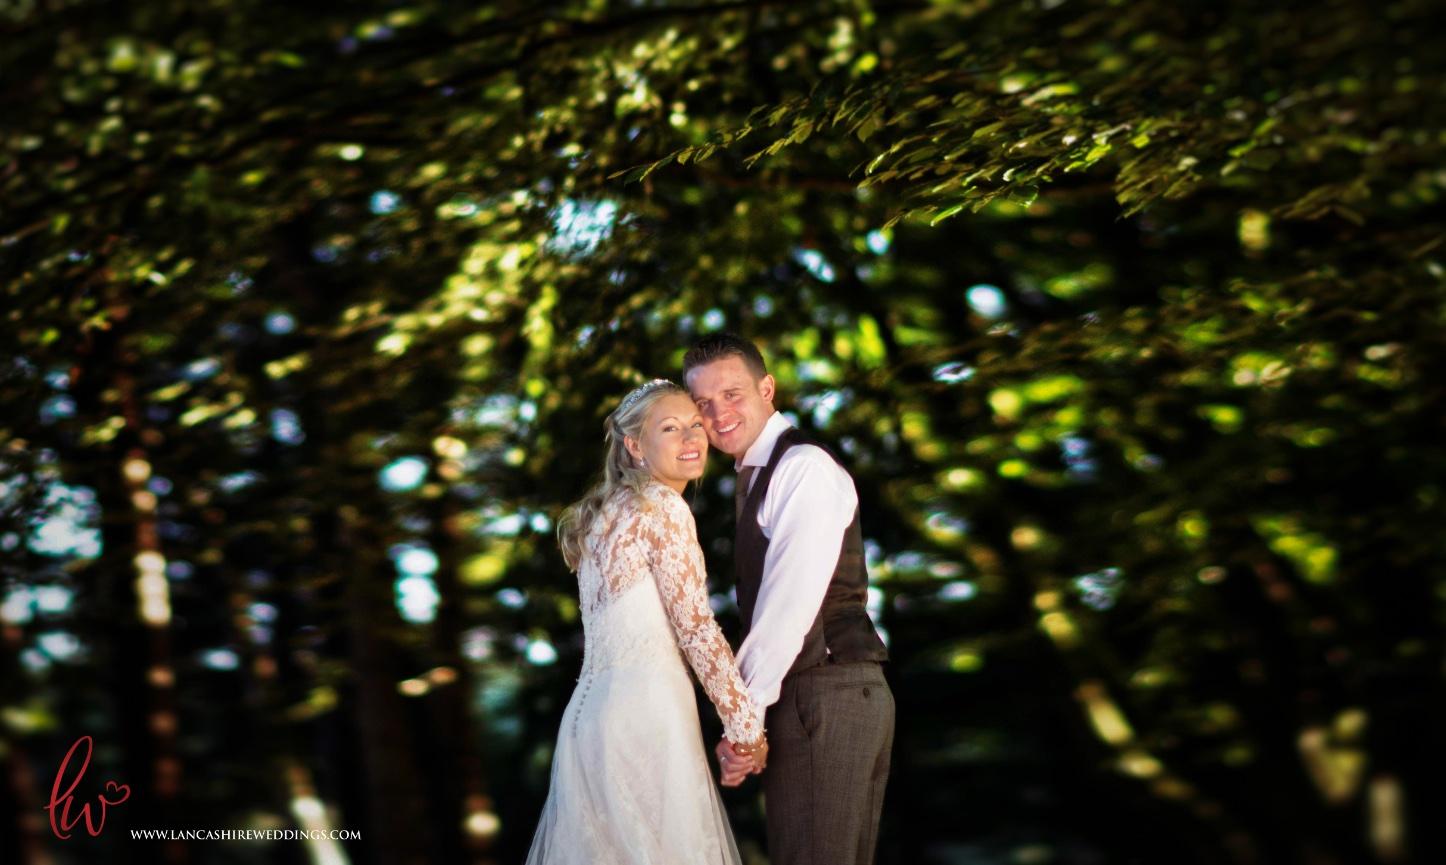 Mad Wedding Photography